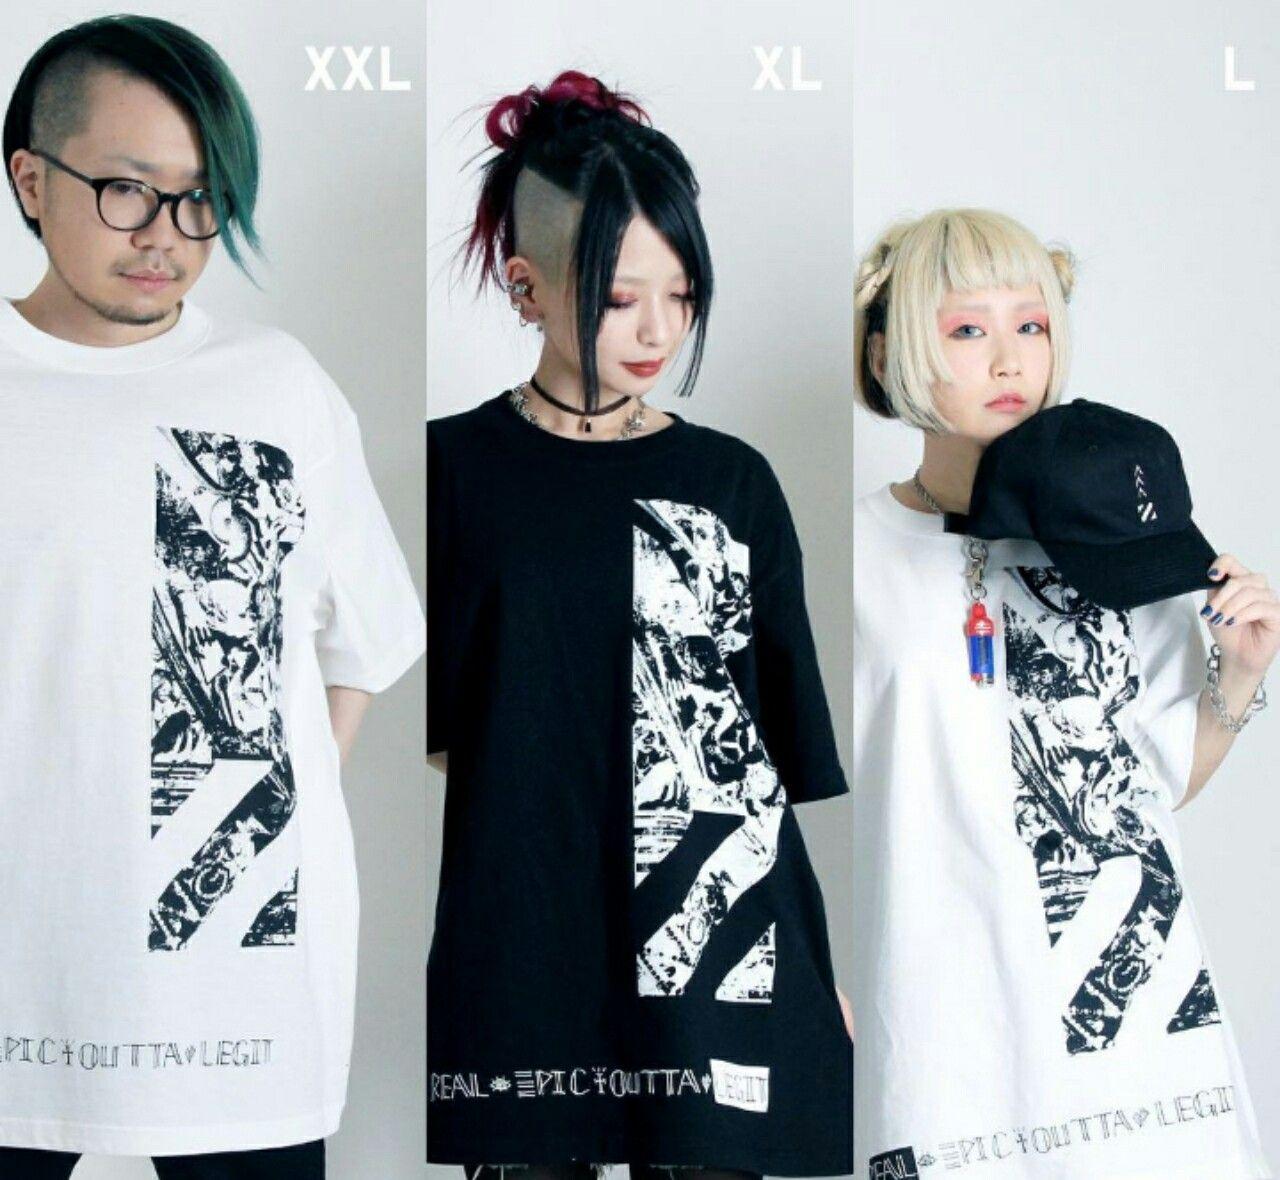 Pin de Ayumu Setsuna em Reol... | Vocaloid, Looks, Memes